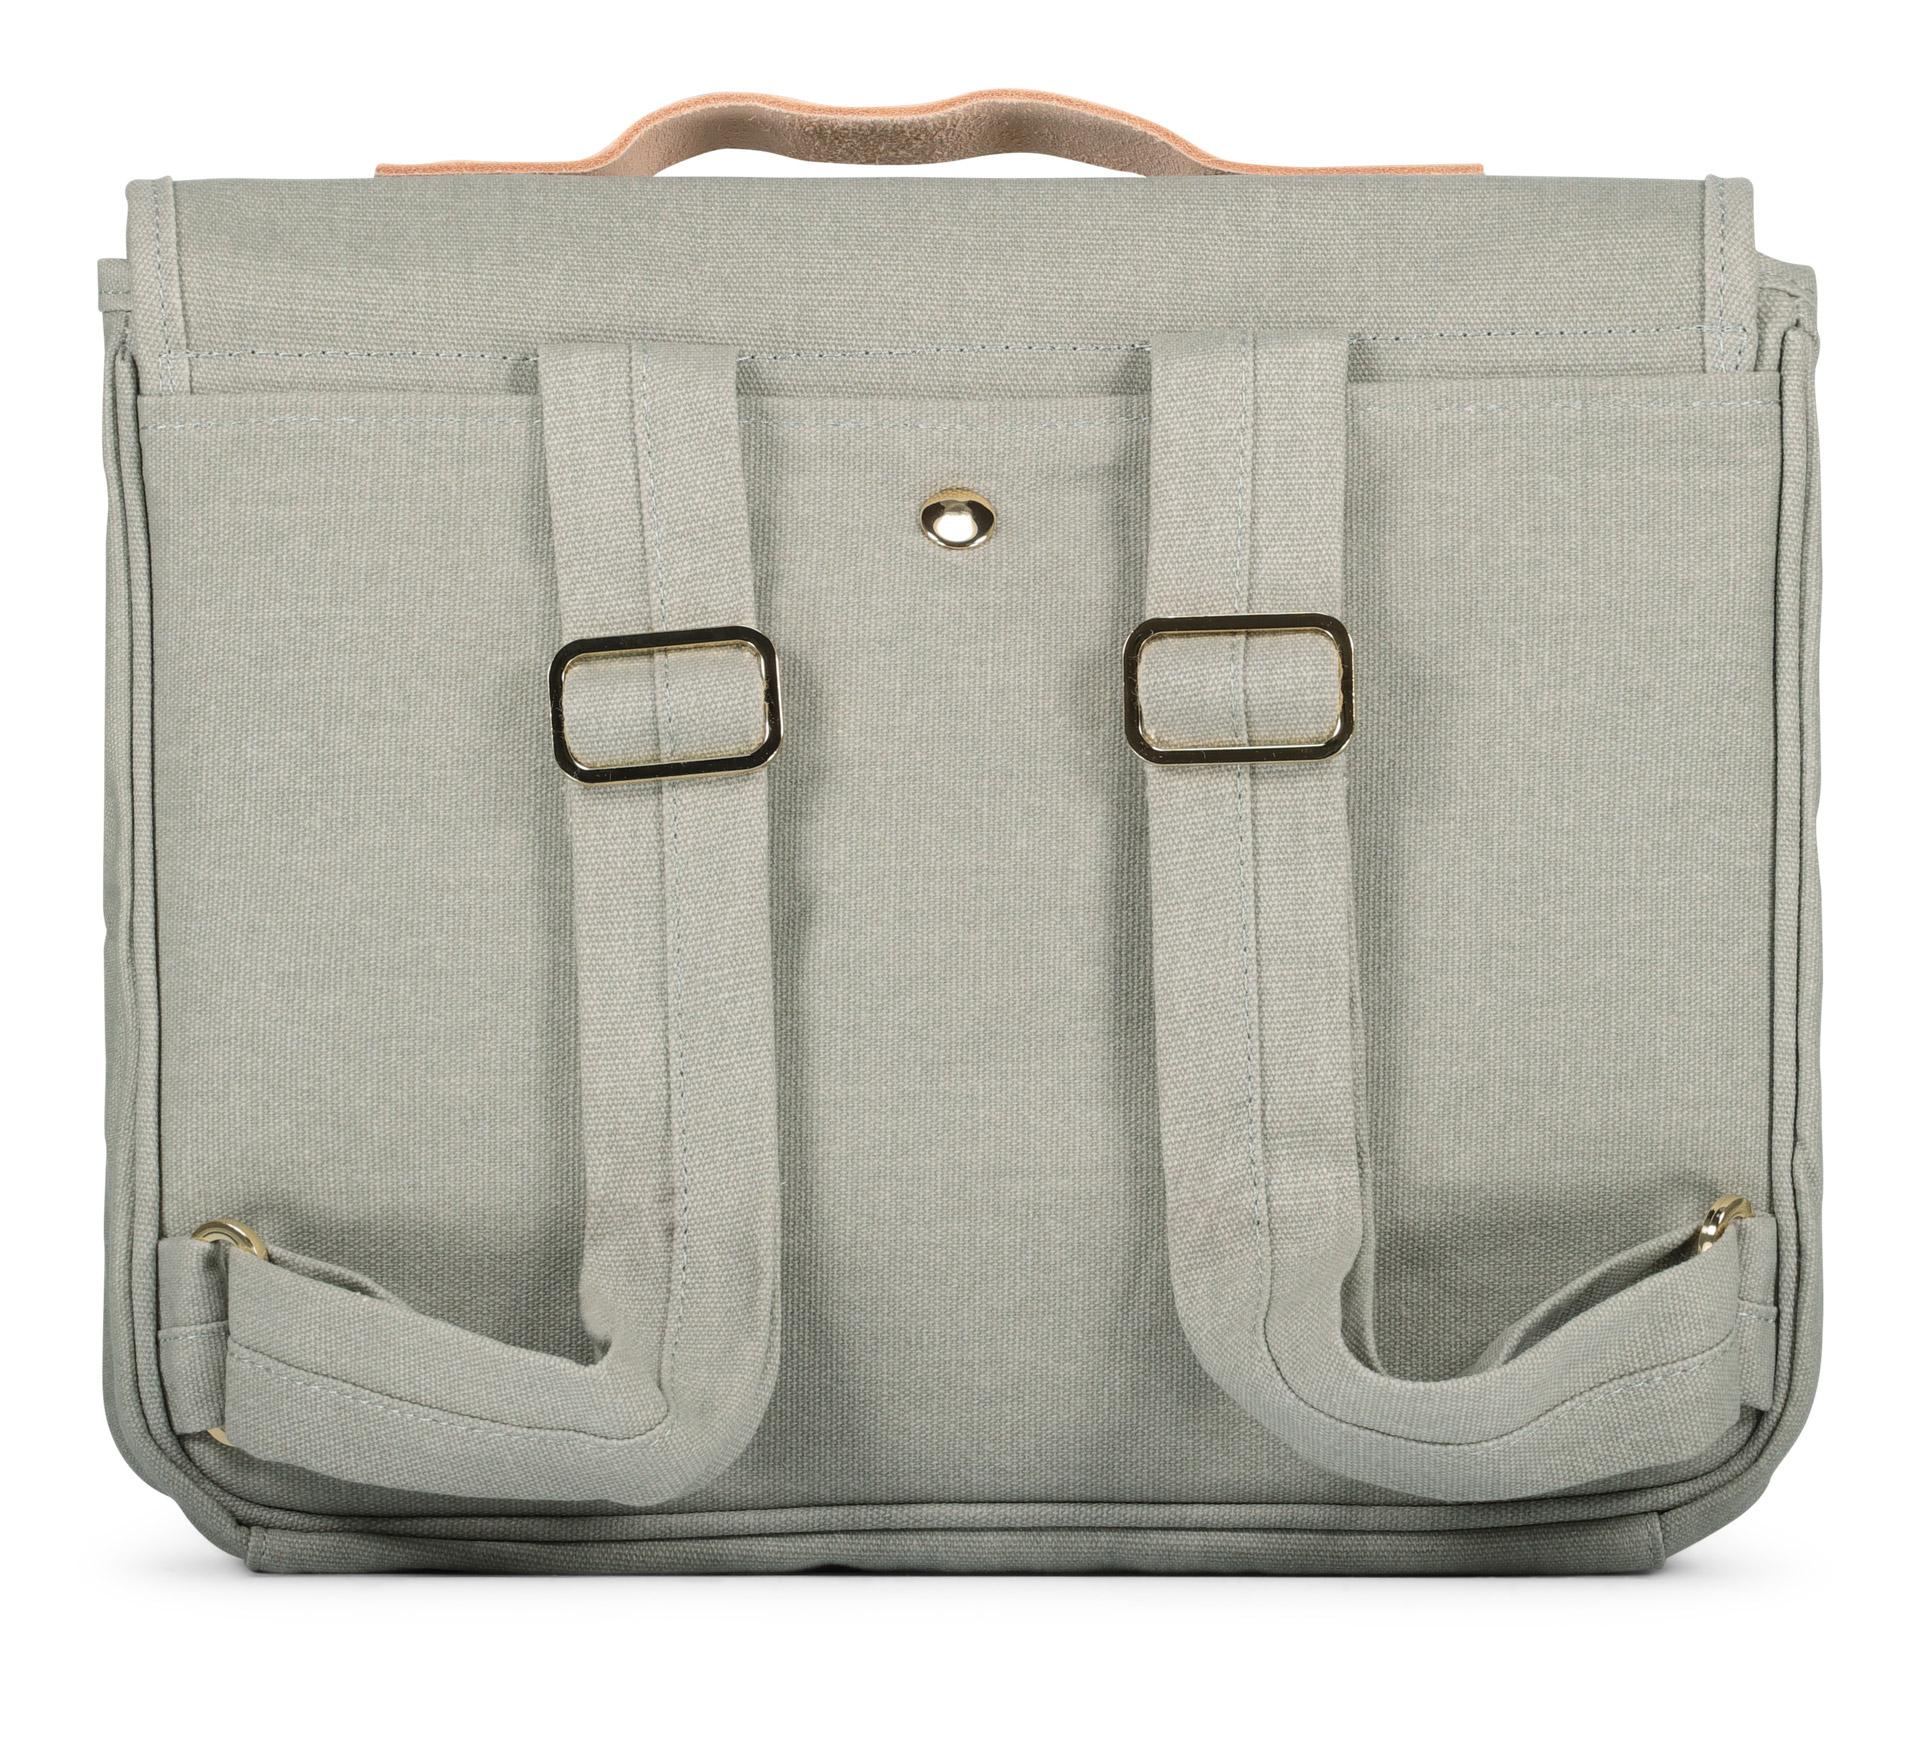 Serge Serge Schoolbag Cartable Cartable Serge Serge Schoolbag Cartable Schoolbag Cartable Schoolbag Serge xRx7np